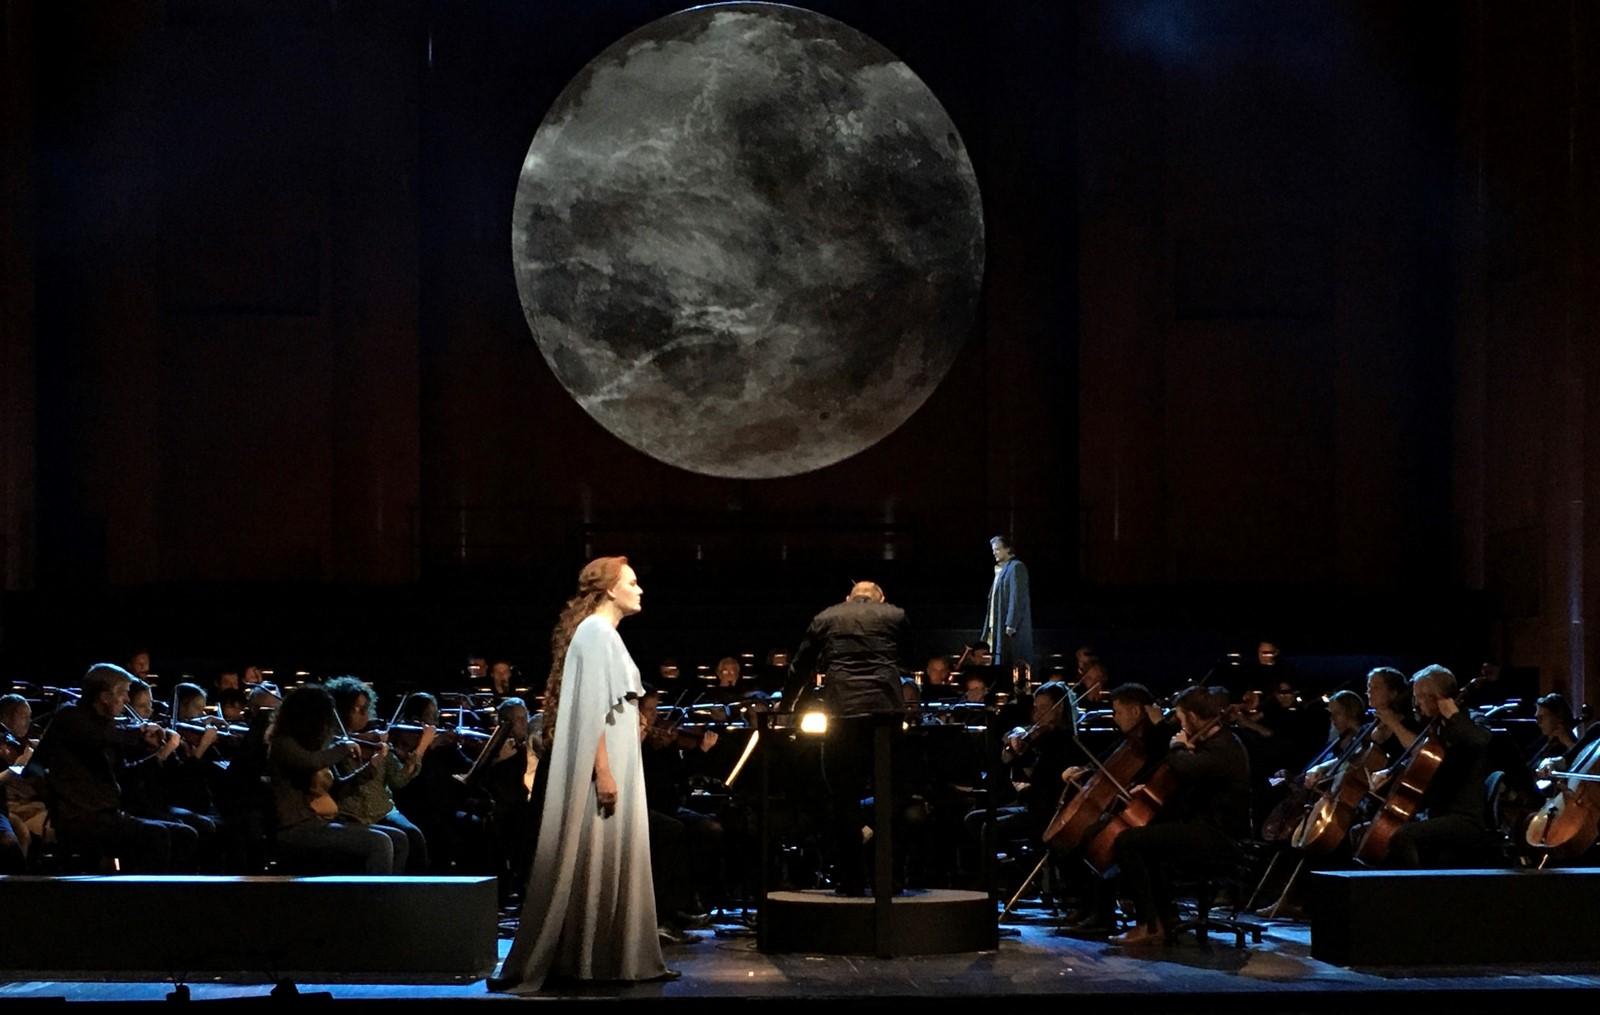 Anmeldelse: Tristan og Isolde, Det Kongelige Teater